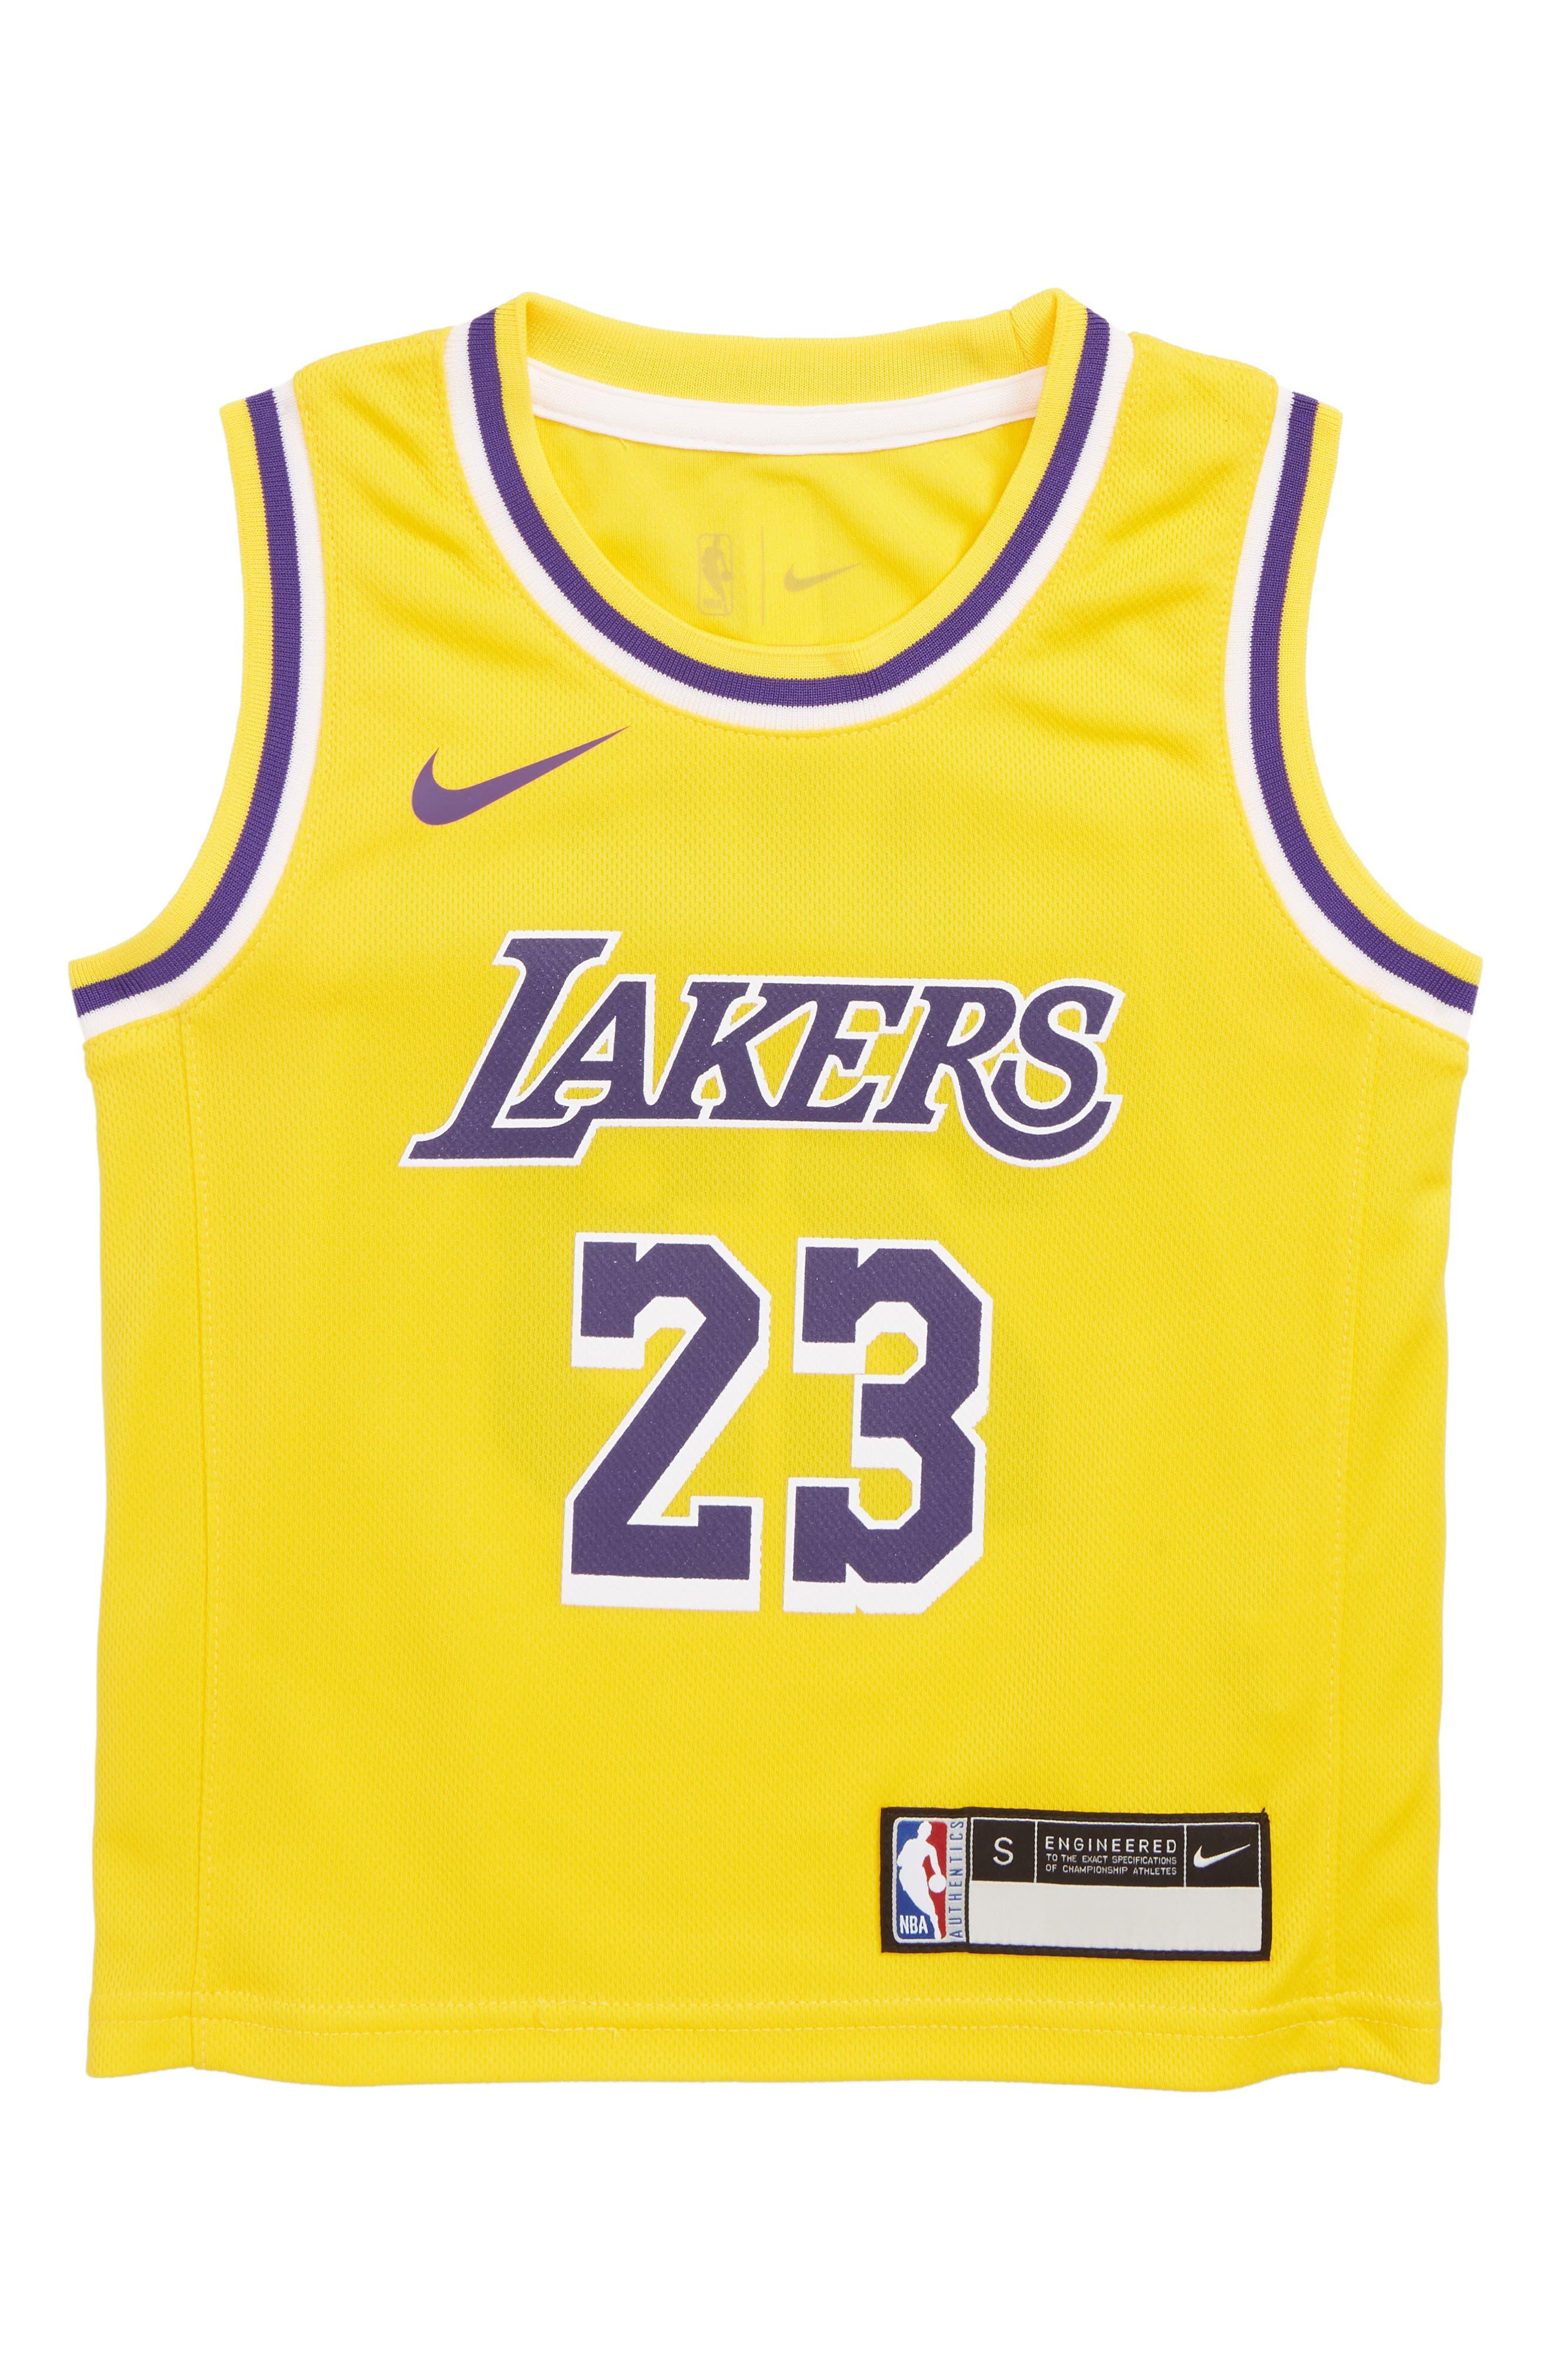 Boys Nba Logo Los Angeles Lakers Lebron James Basketball Jersey Size M (56)  Metallic